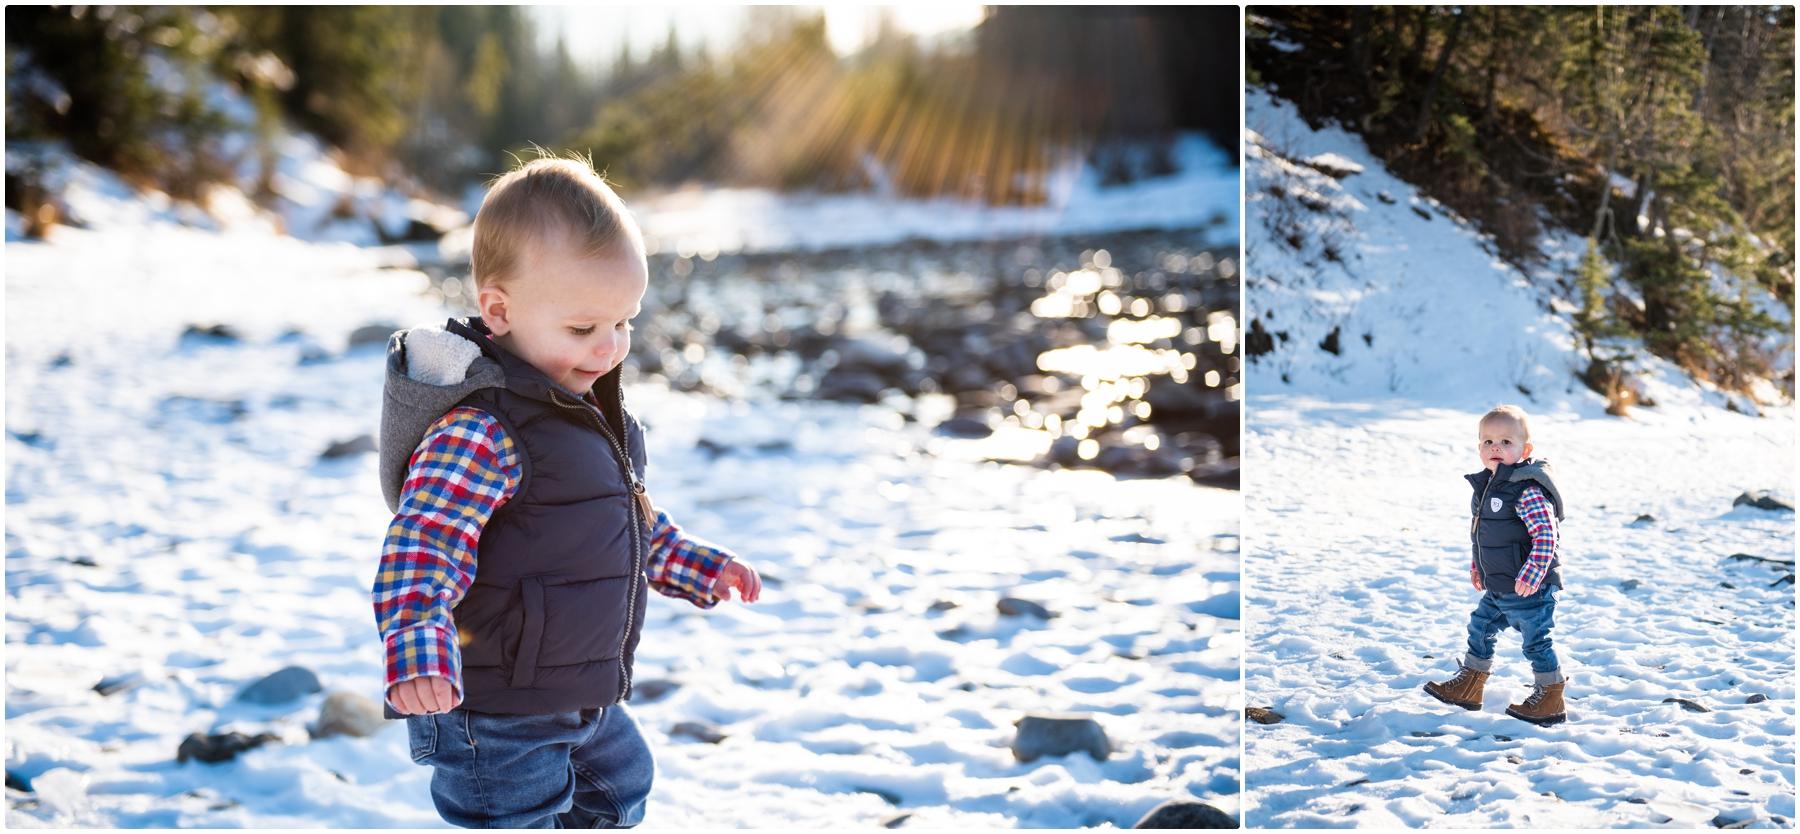 Calgary Winter Family Photographer - Bragg Creek Provincial Park